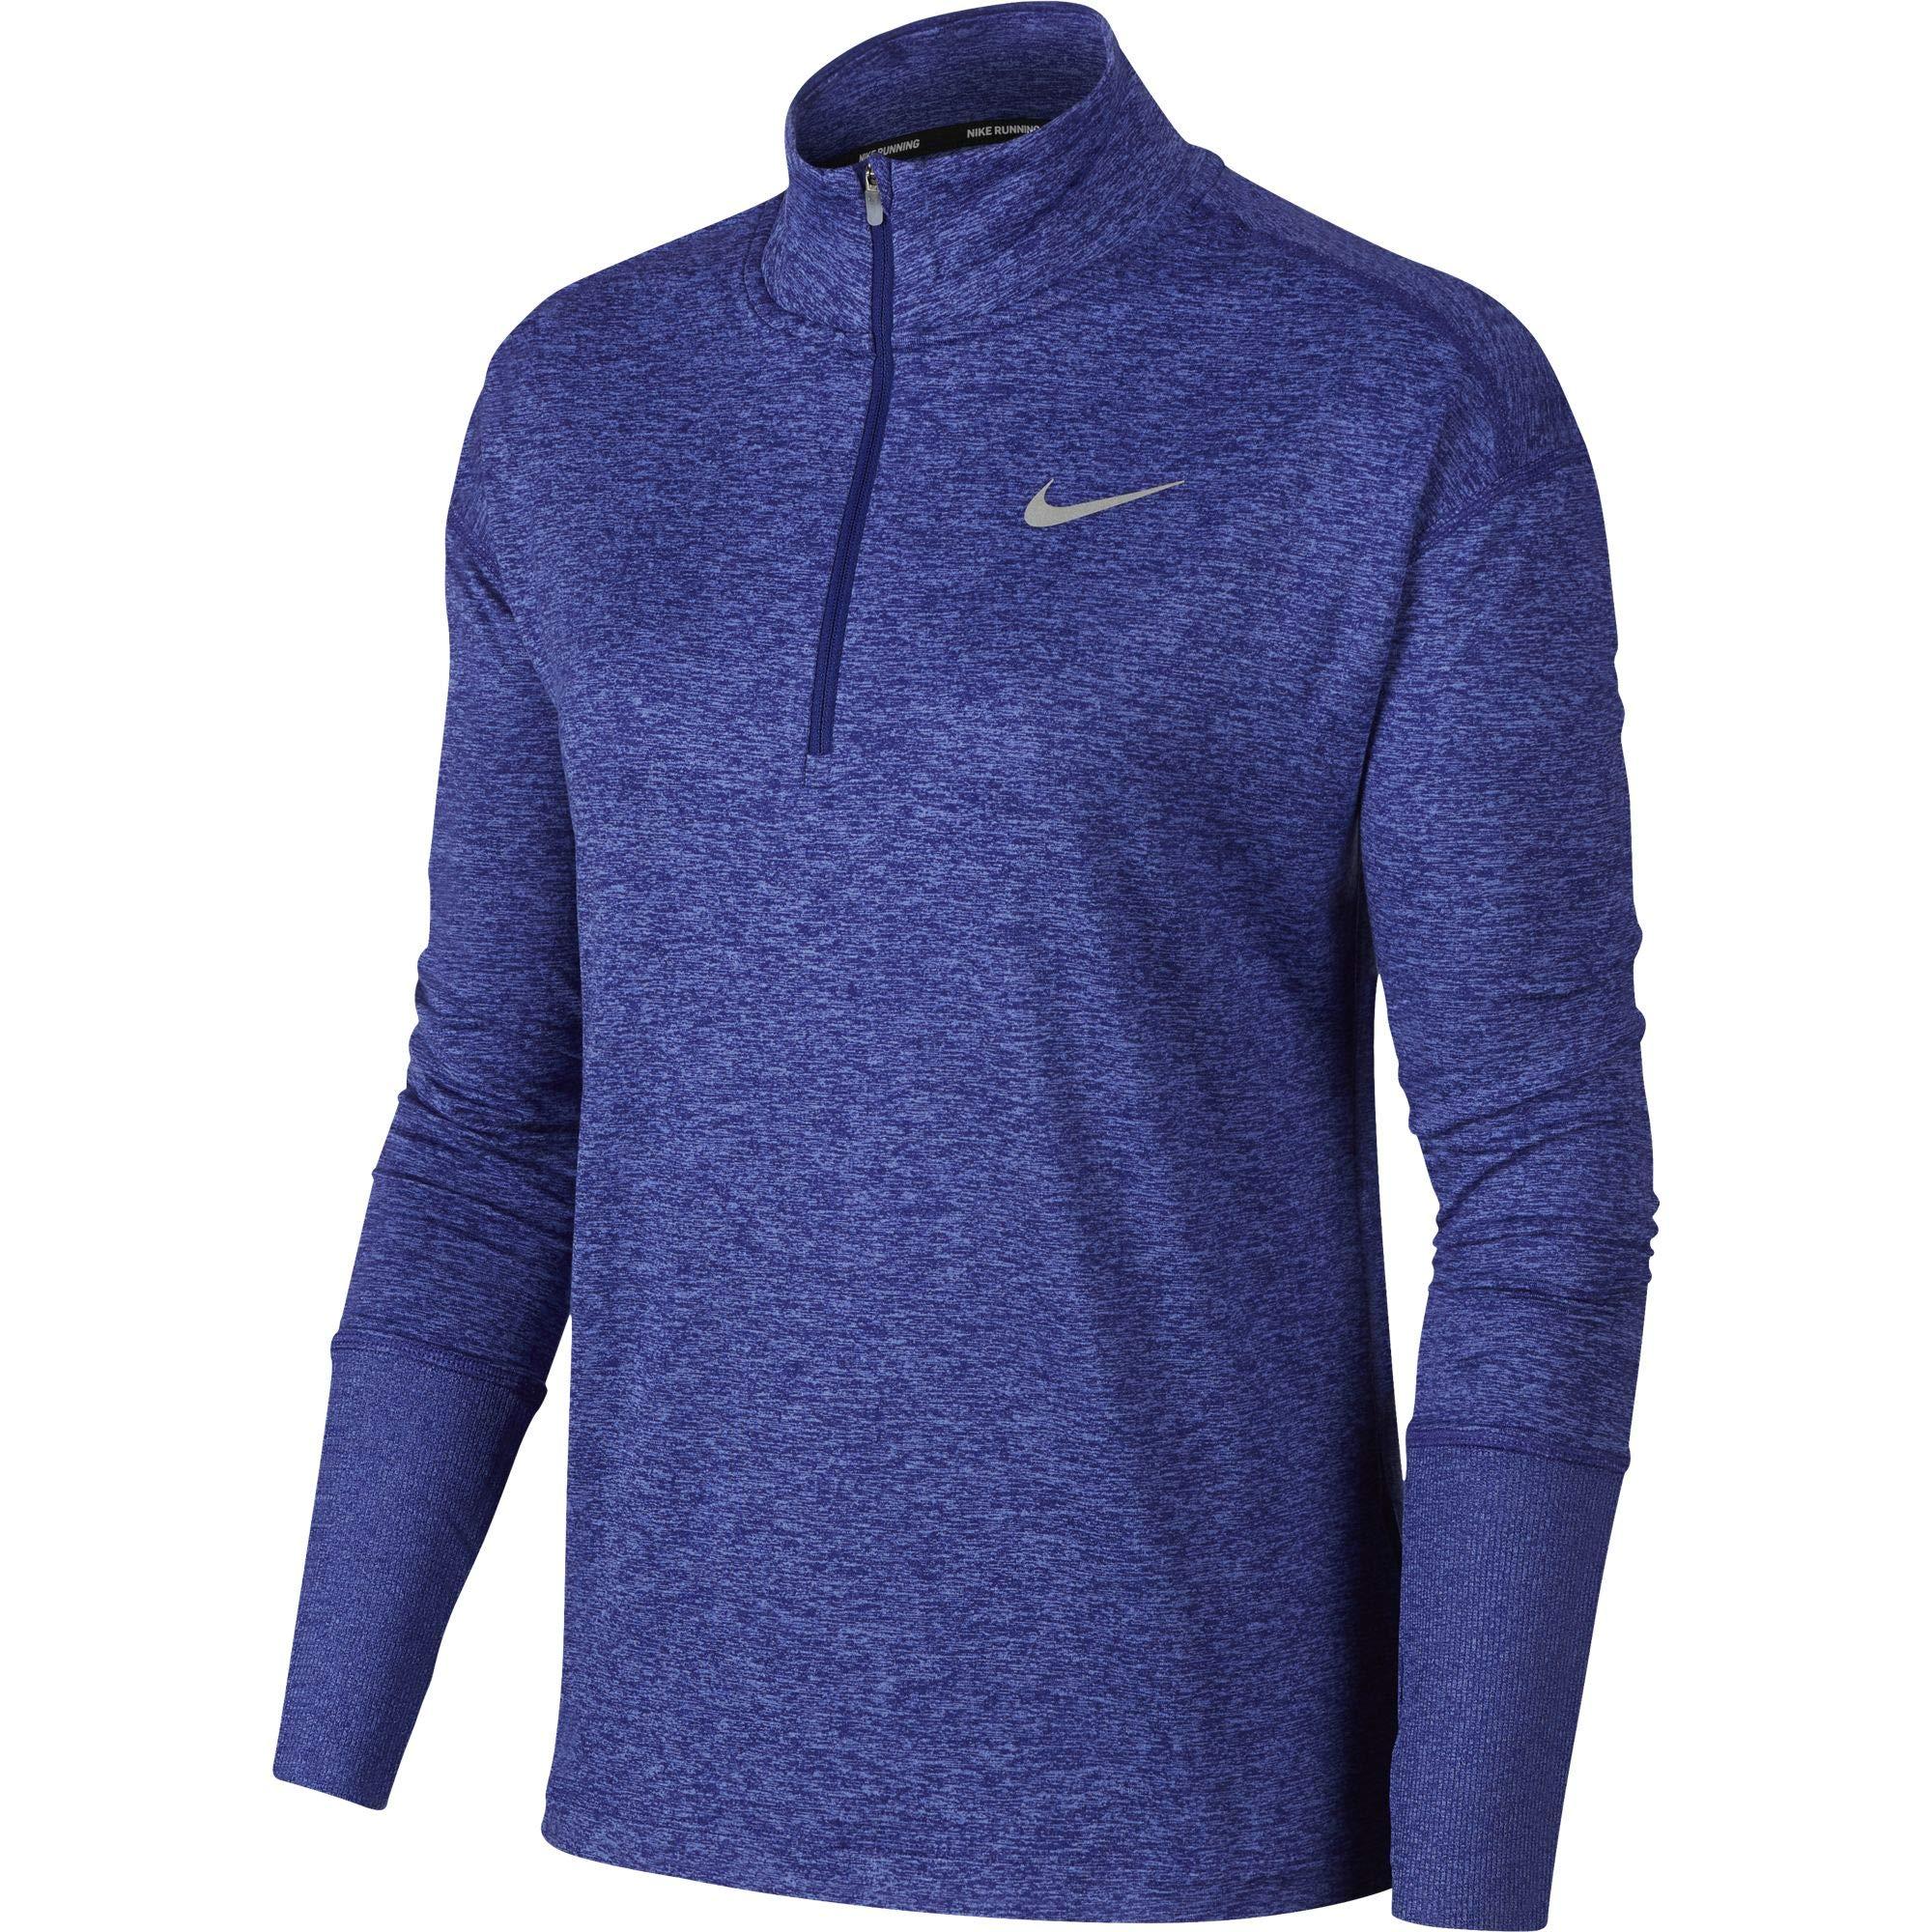 Nike Women's Element 1/2 Zip Running Top Regency Purple/Rush Violet/Heather Size Small by Nike (Image #1)